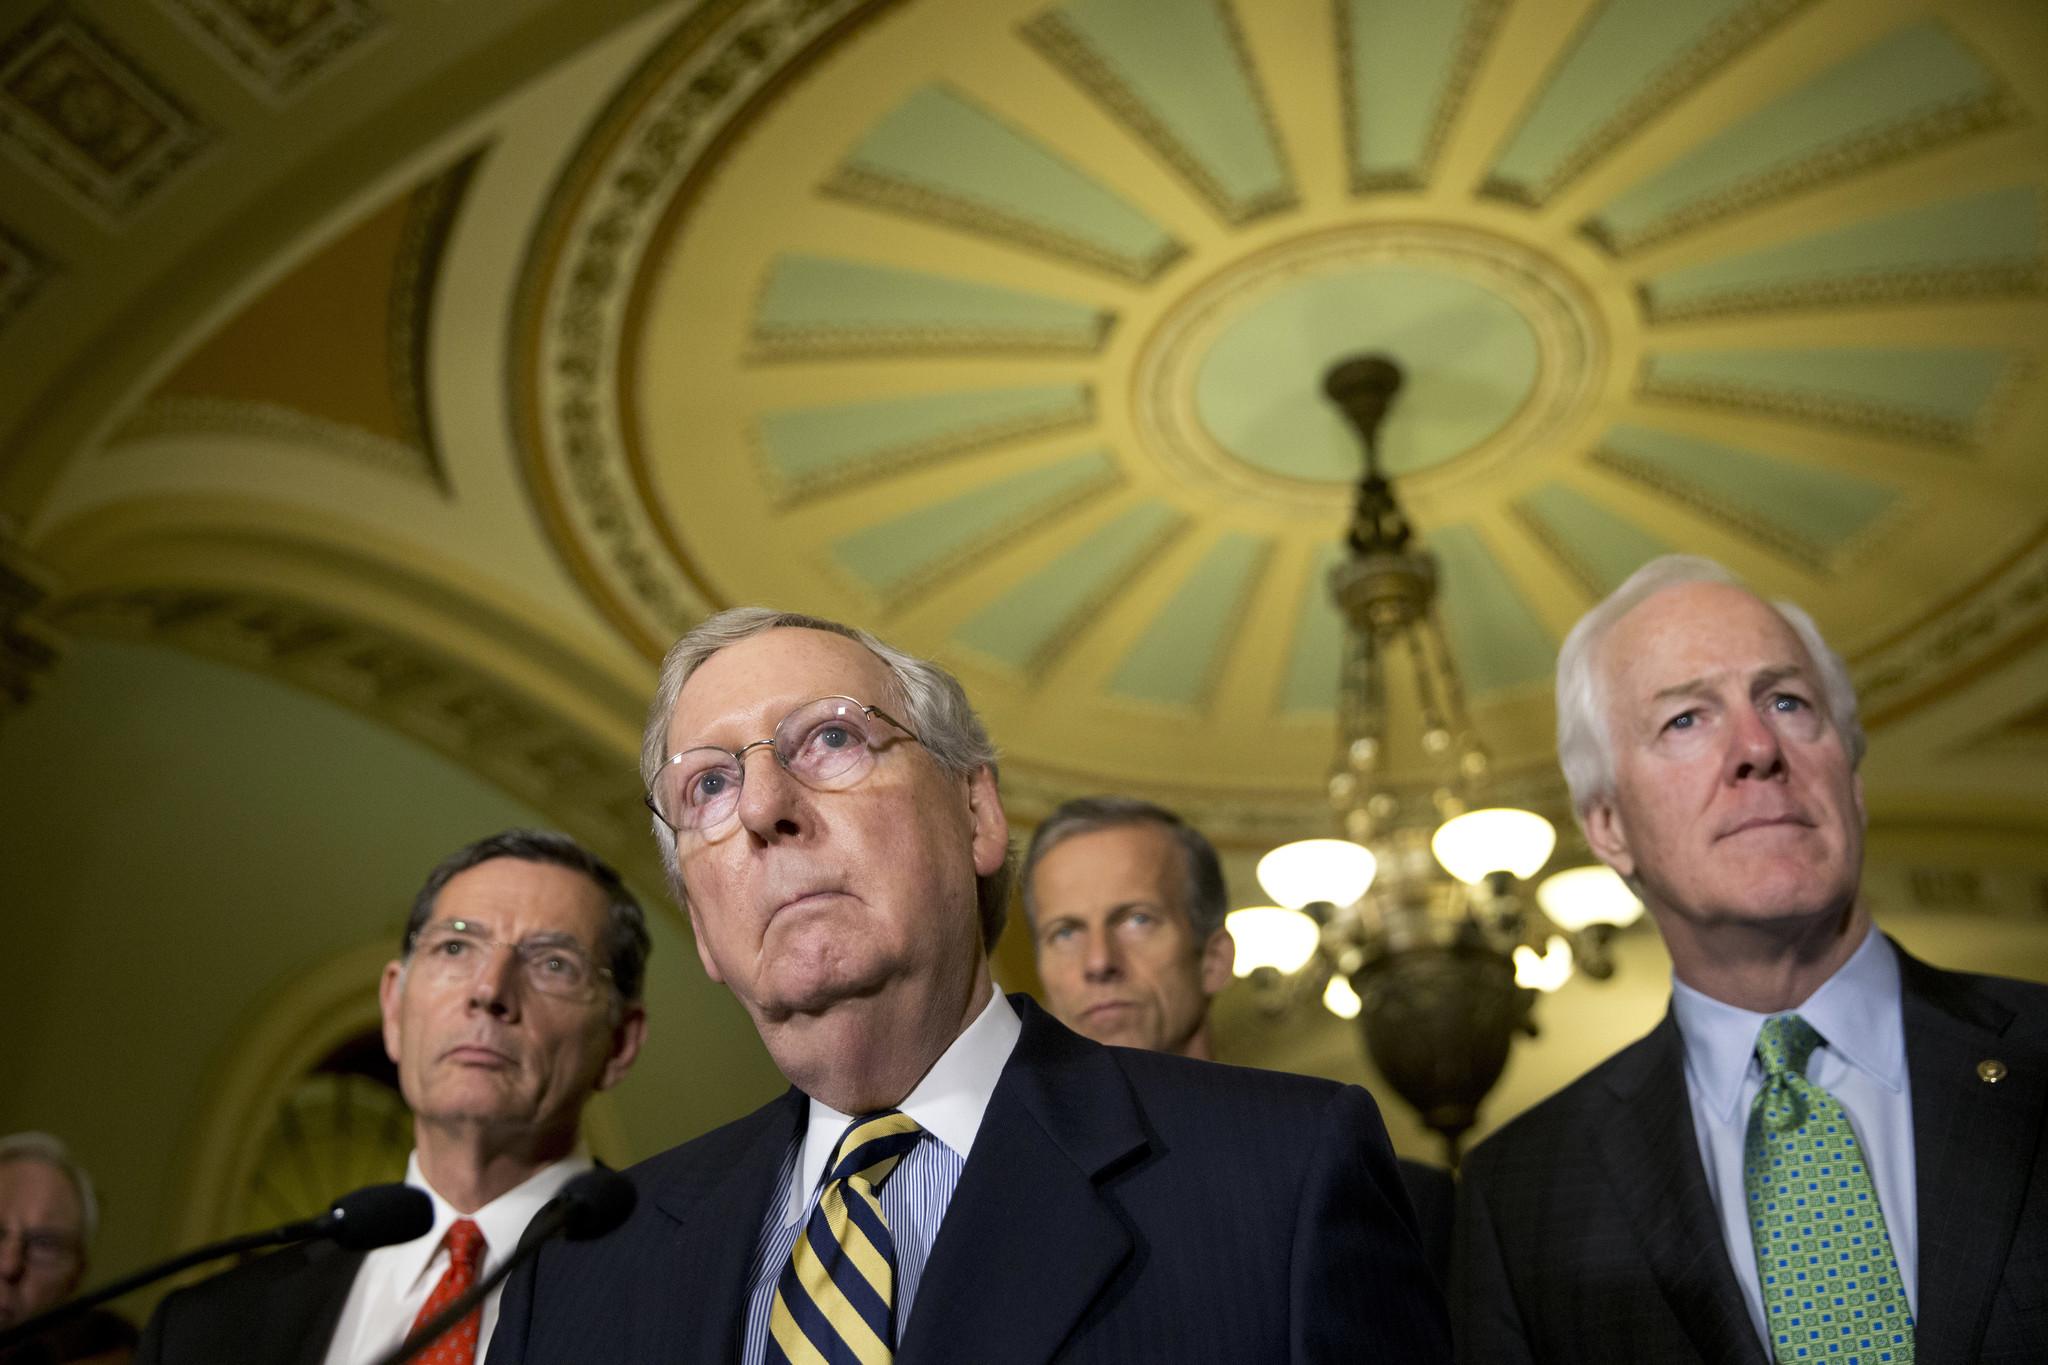 Ct-senate-stopgap-spending-bill-zika-20160928